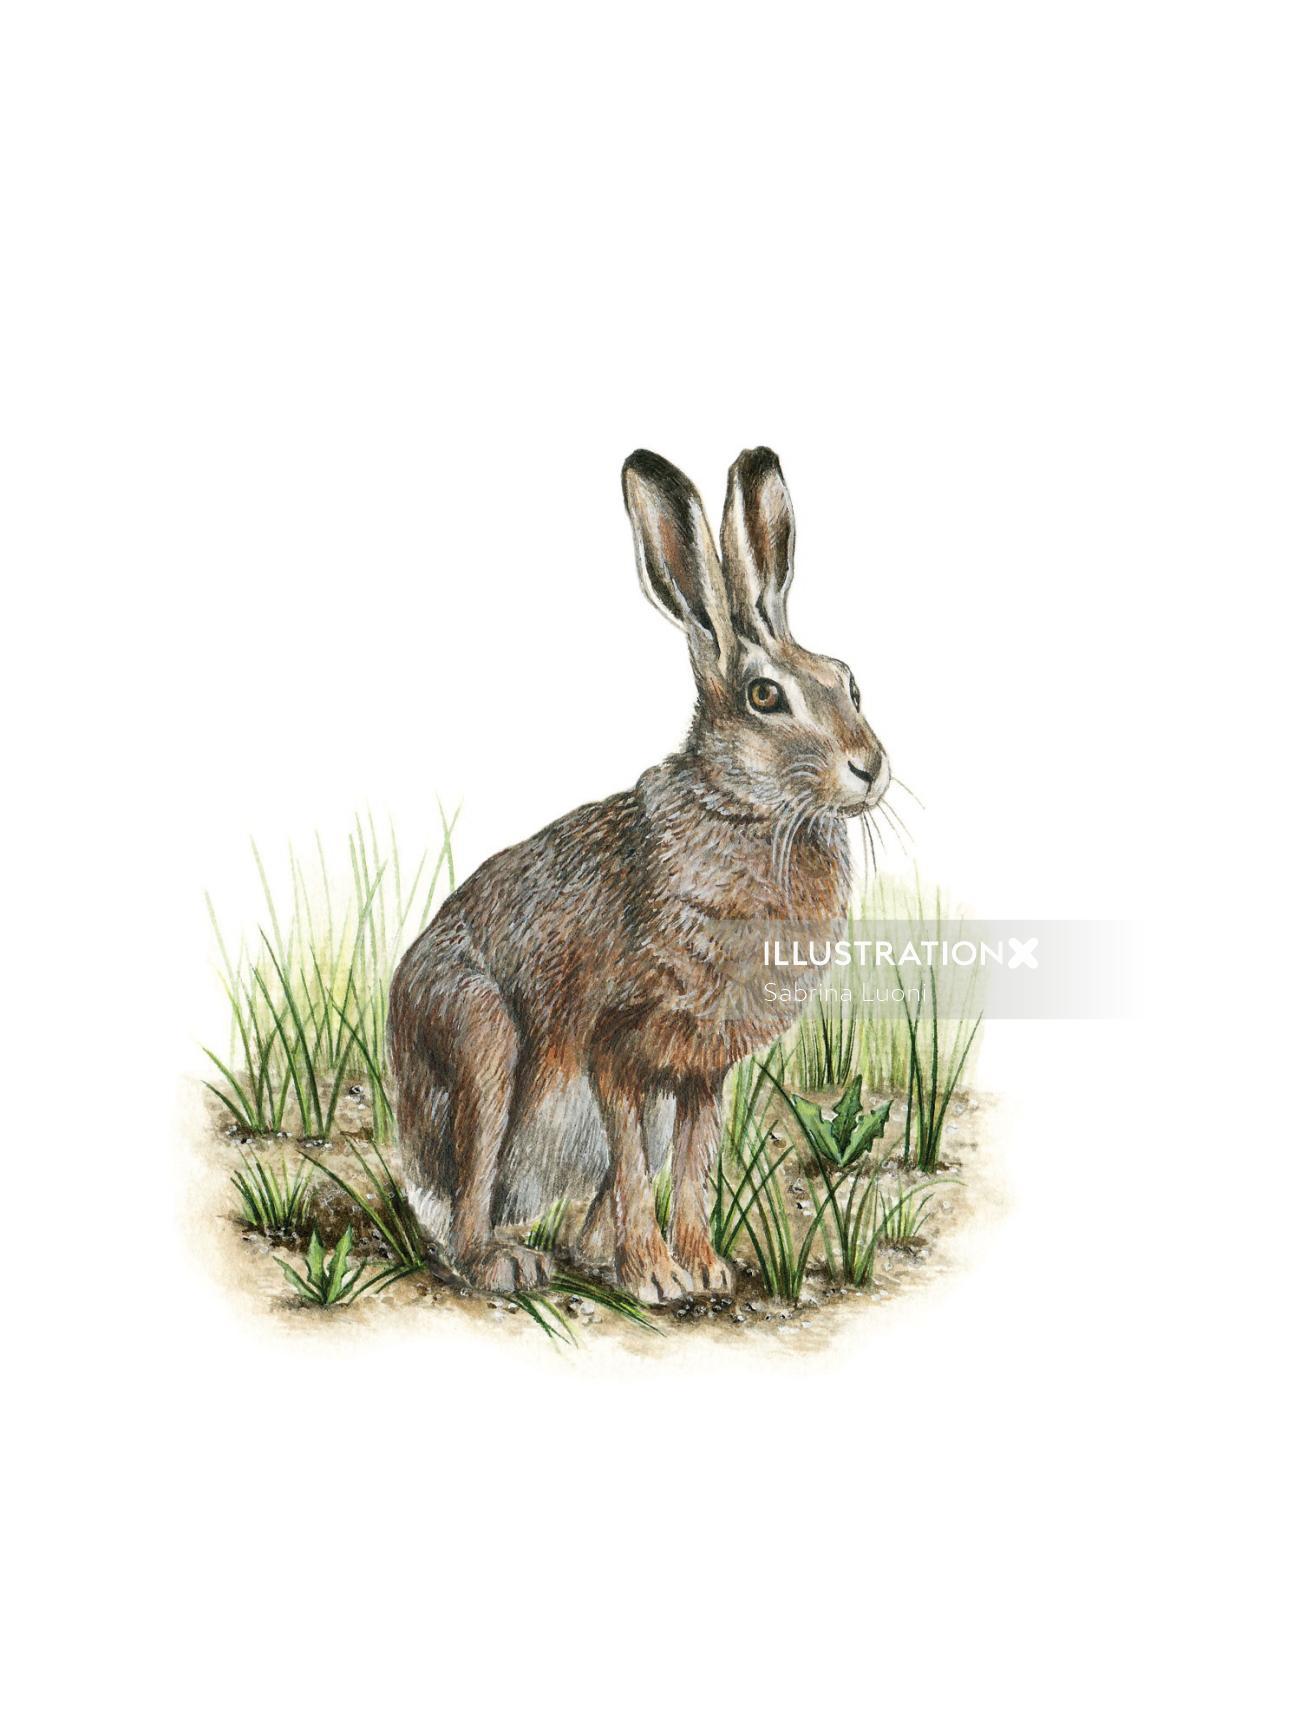 European hare (Lepus europeaus)